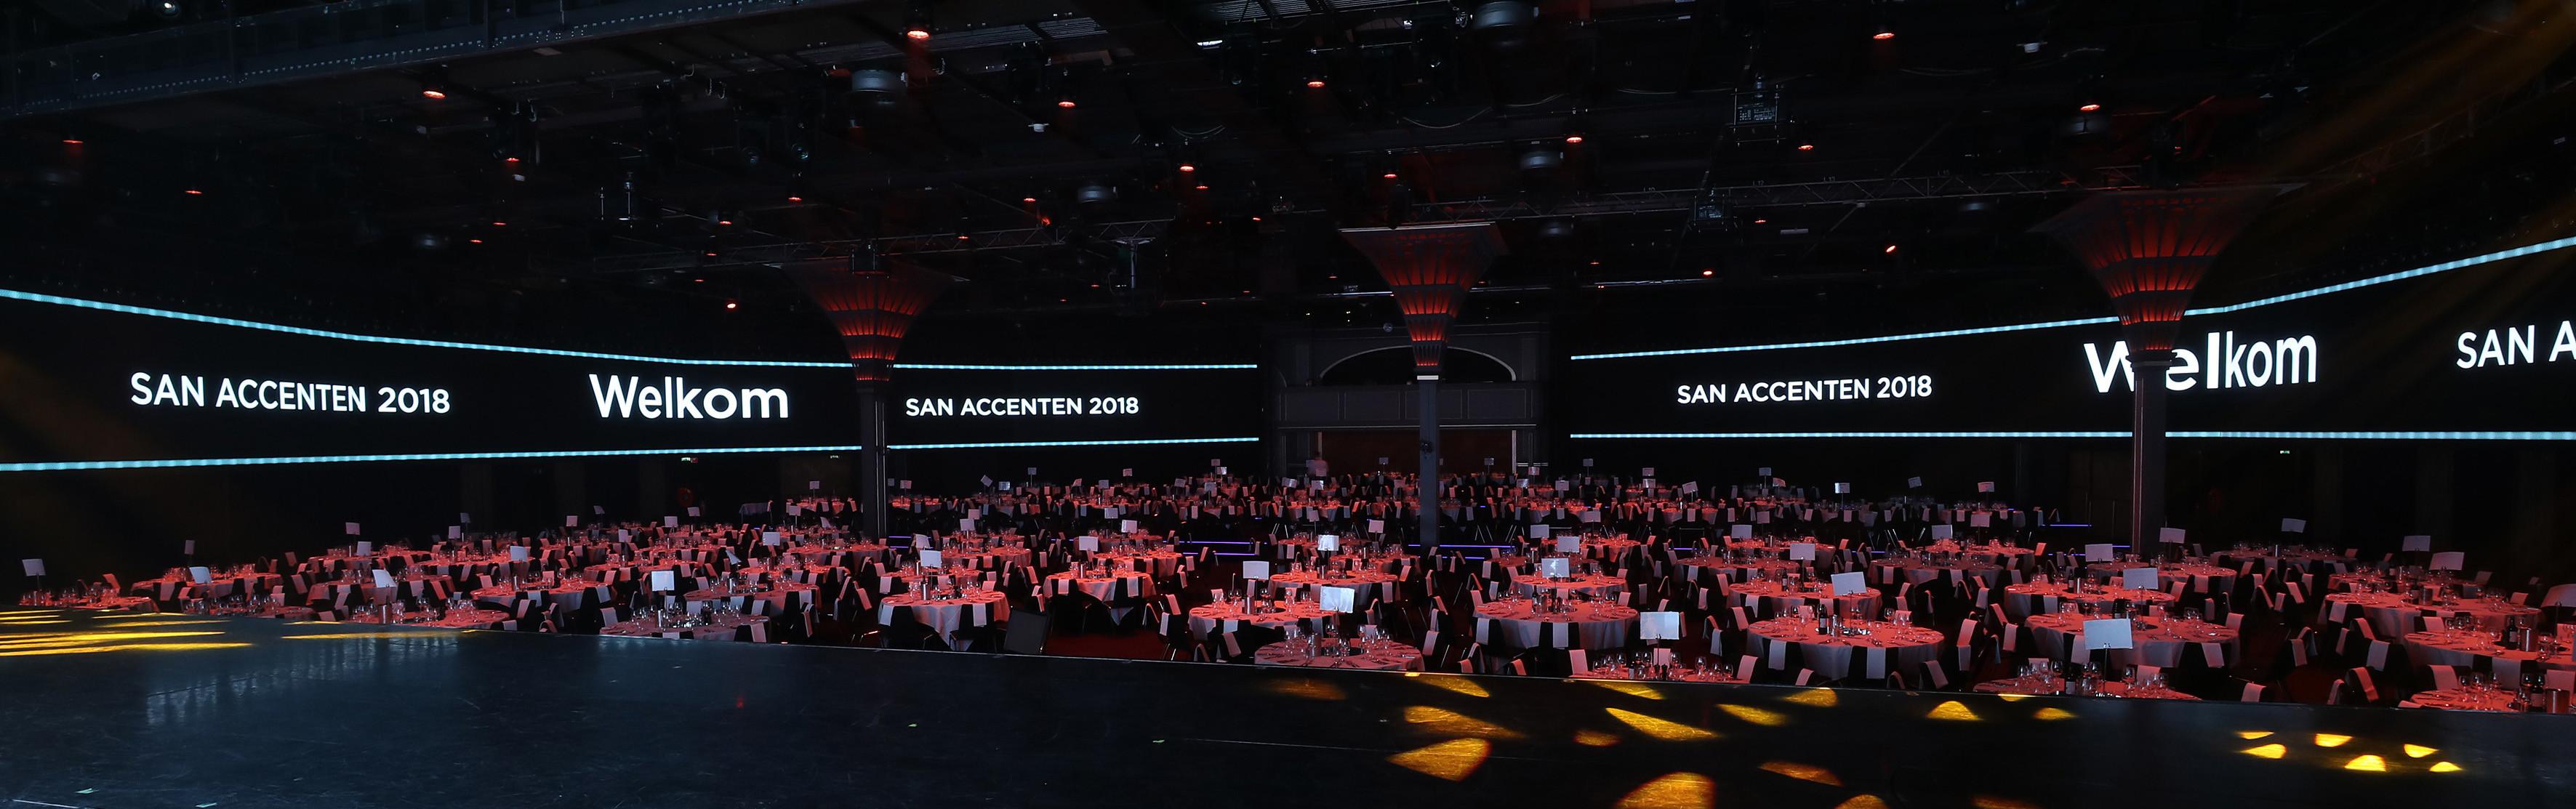 San Accenten 2018 Studio 21